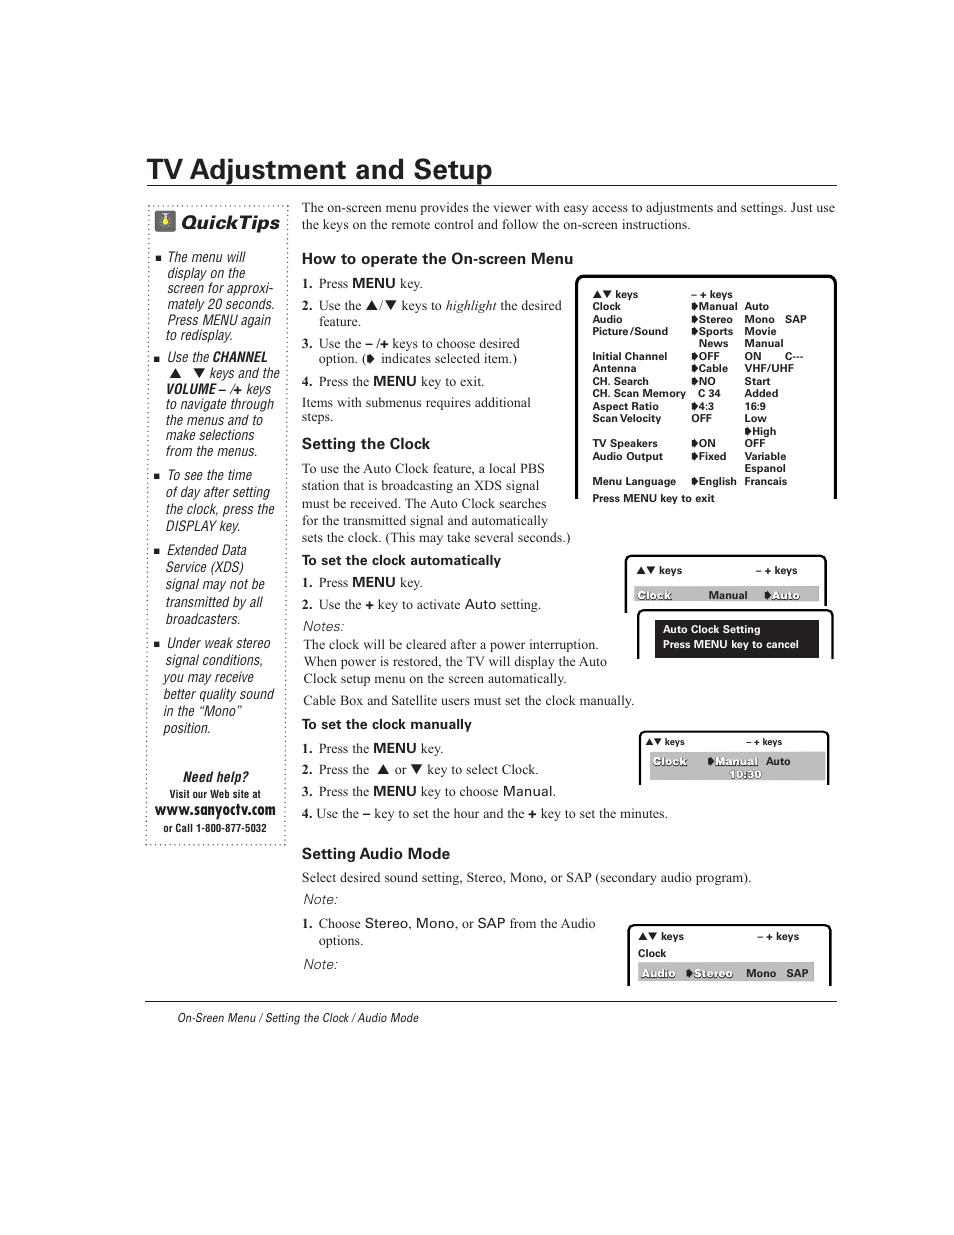 tv adjustment and setup quicktips sanyo ds27930 user manual rh manualsdir com Sanyo TV Model Sanyo Model Numbers